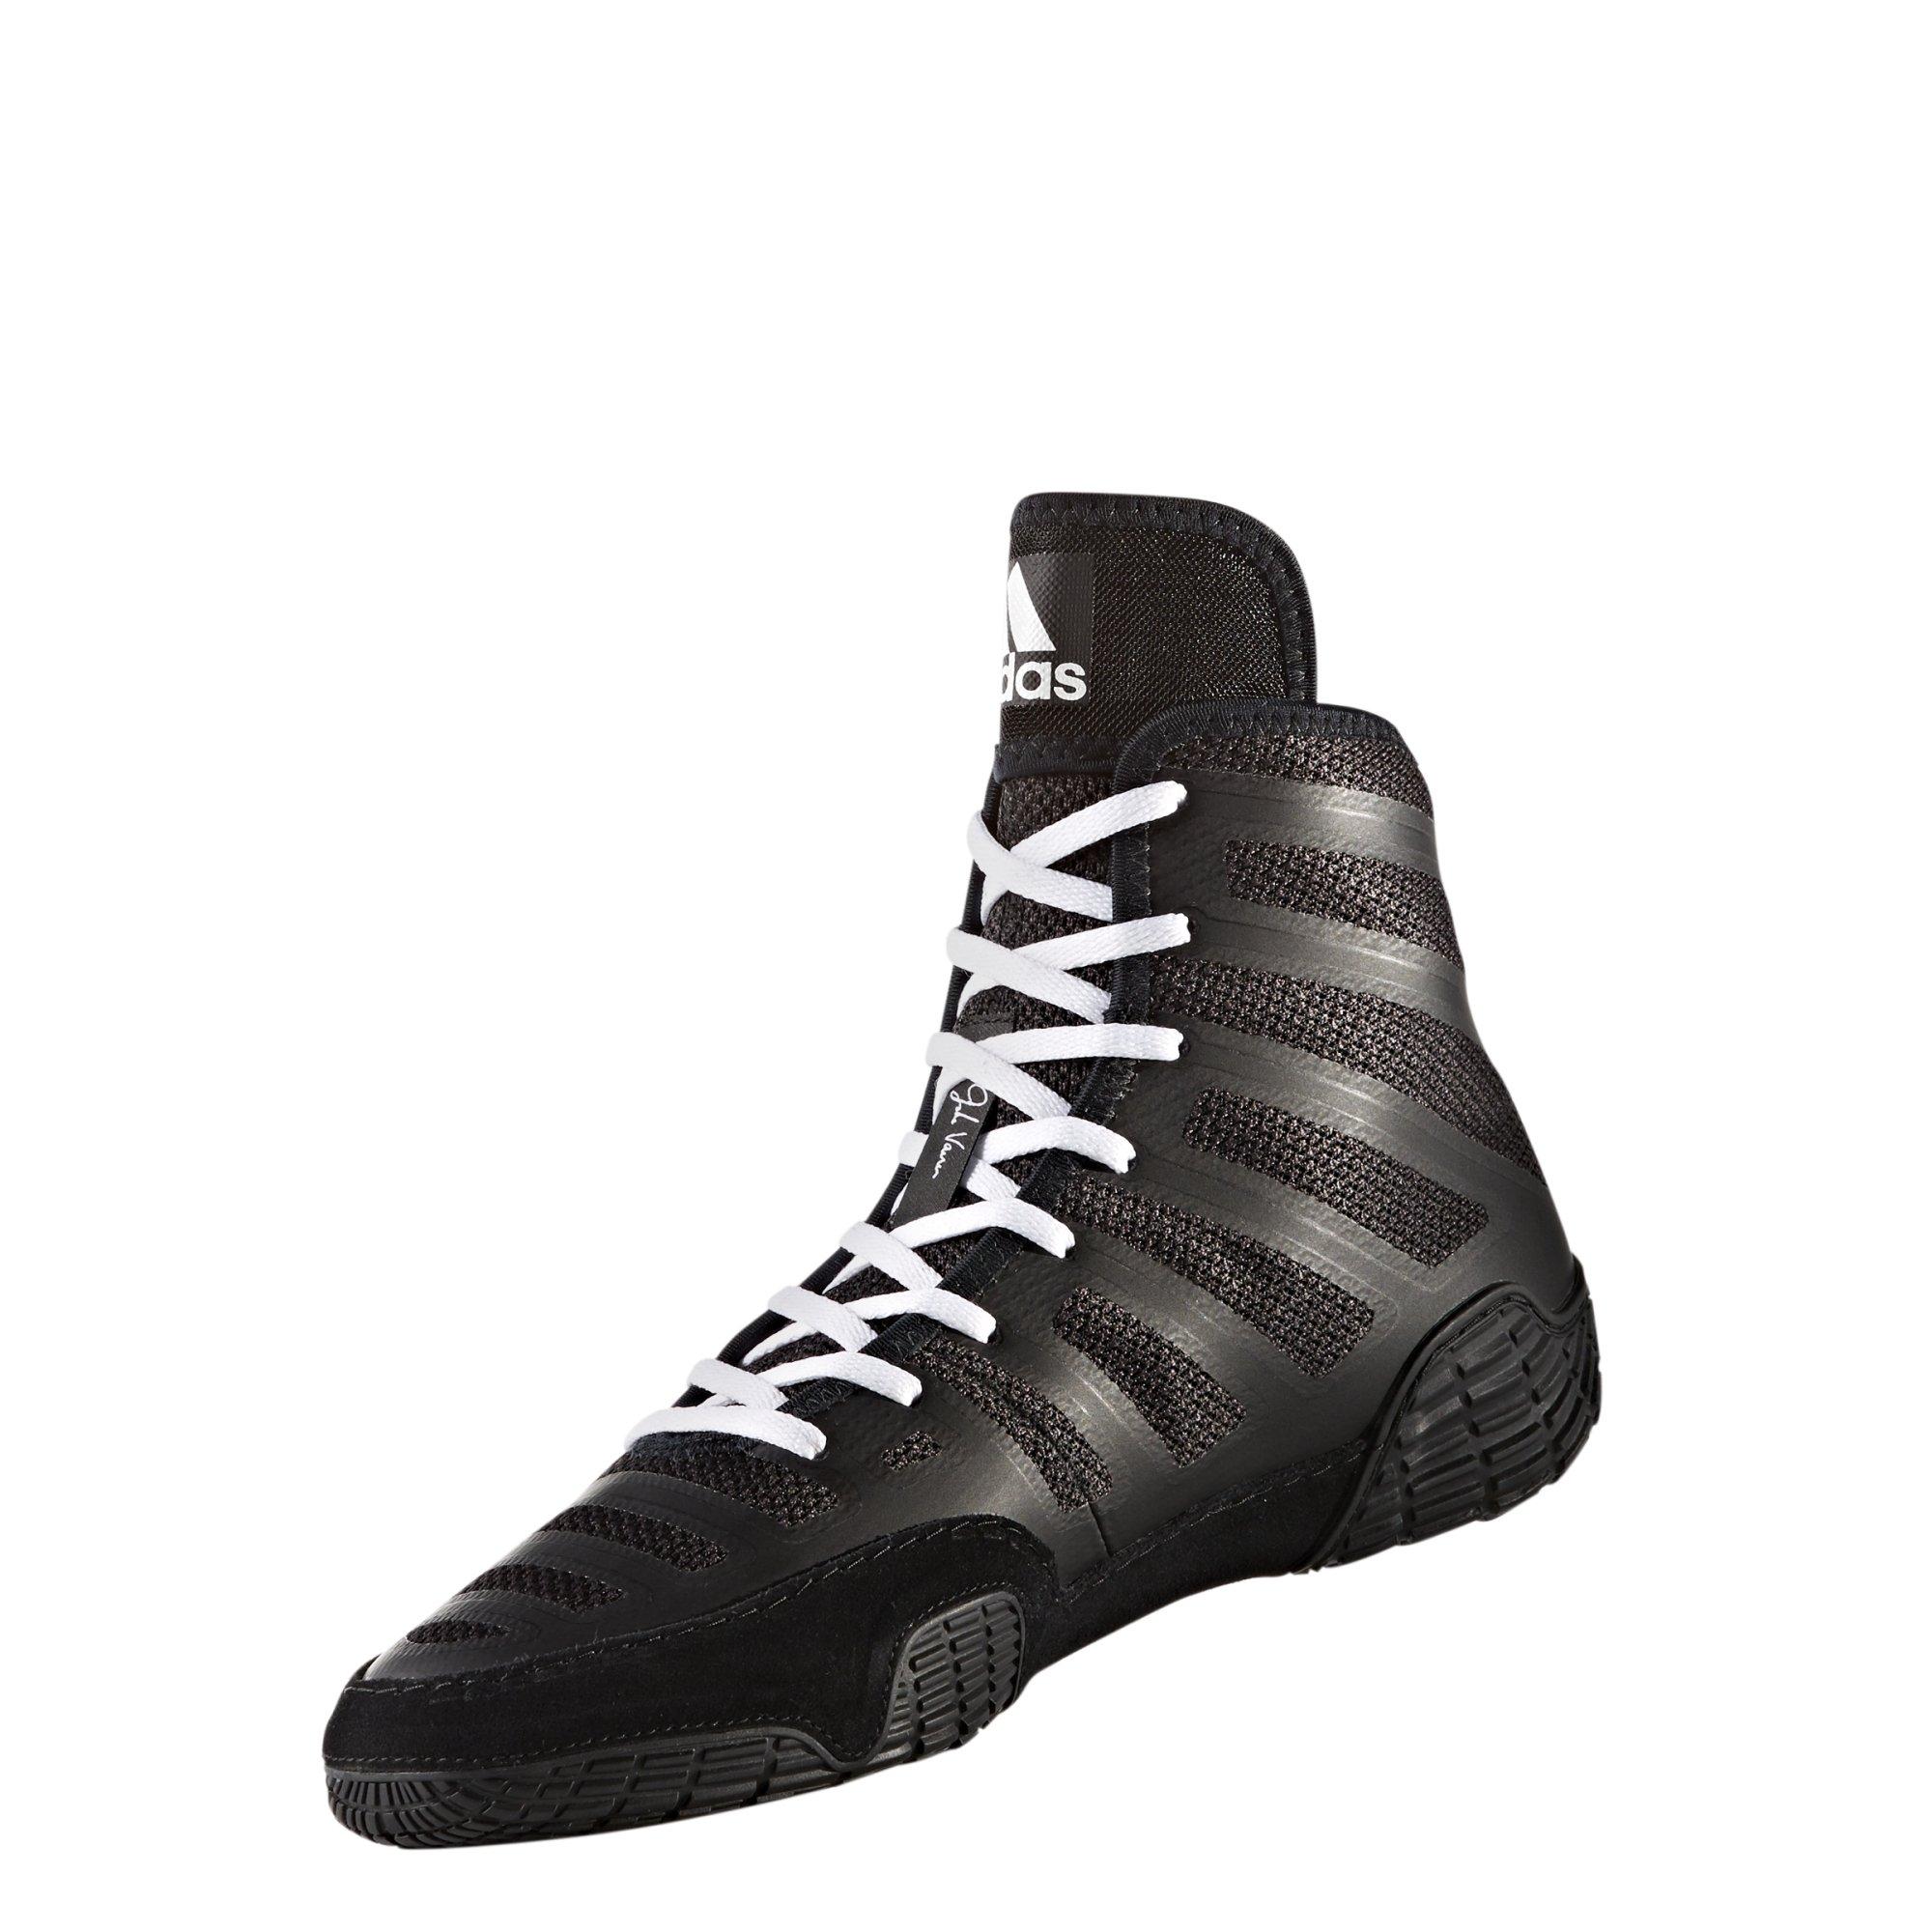 adidas Adizero Varner Men's Wrestling Shoes, Black/White/Black Size 9 by Adidas